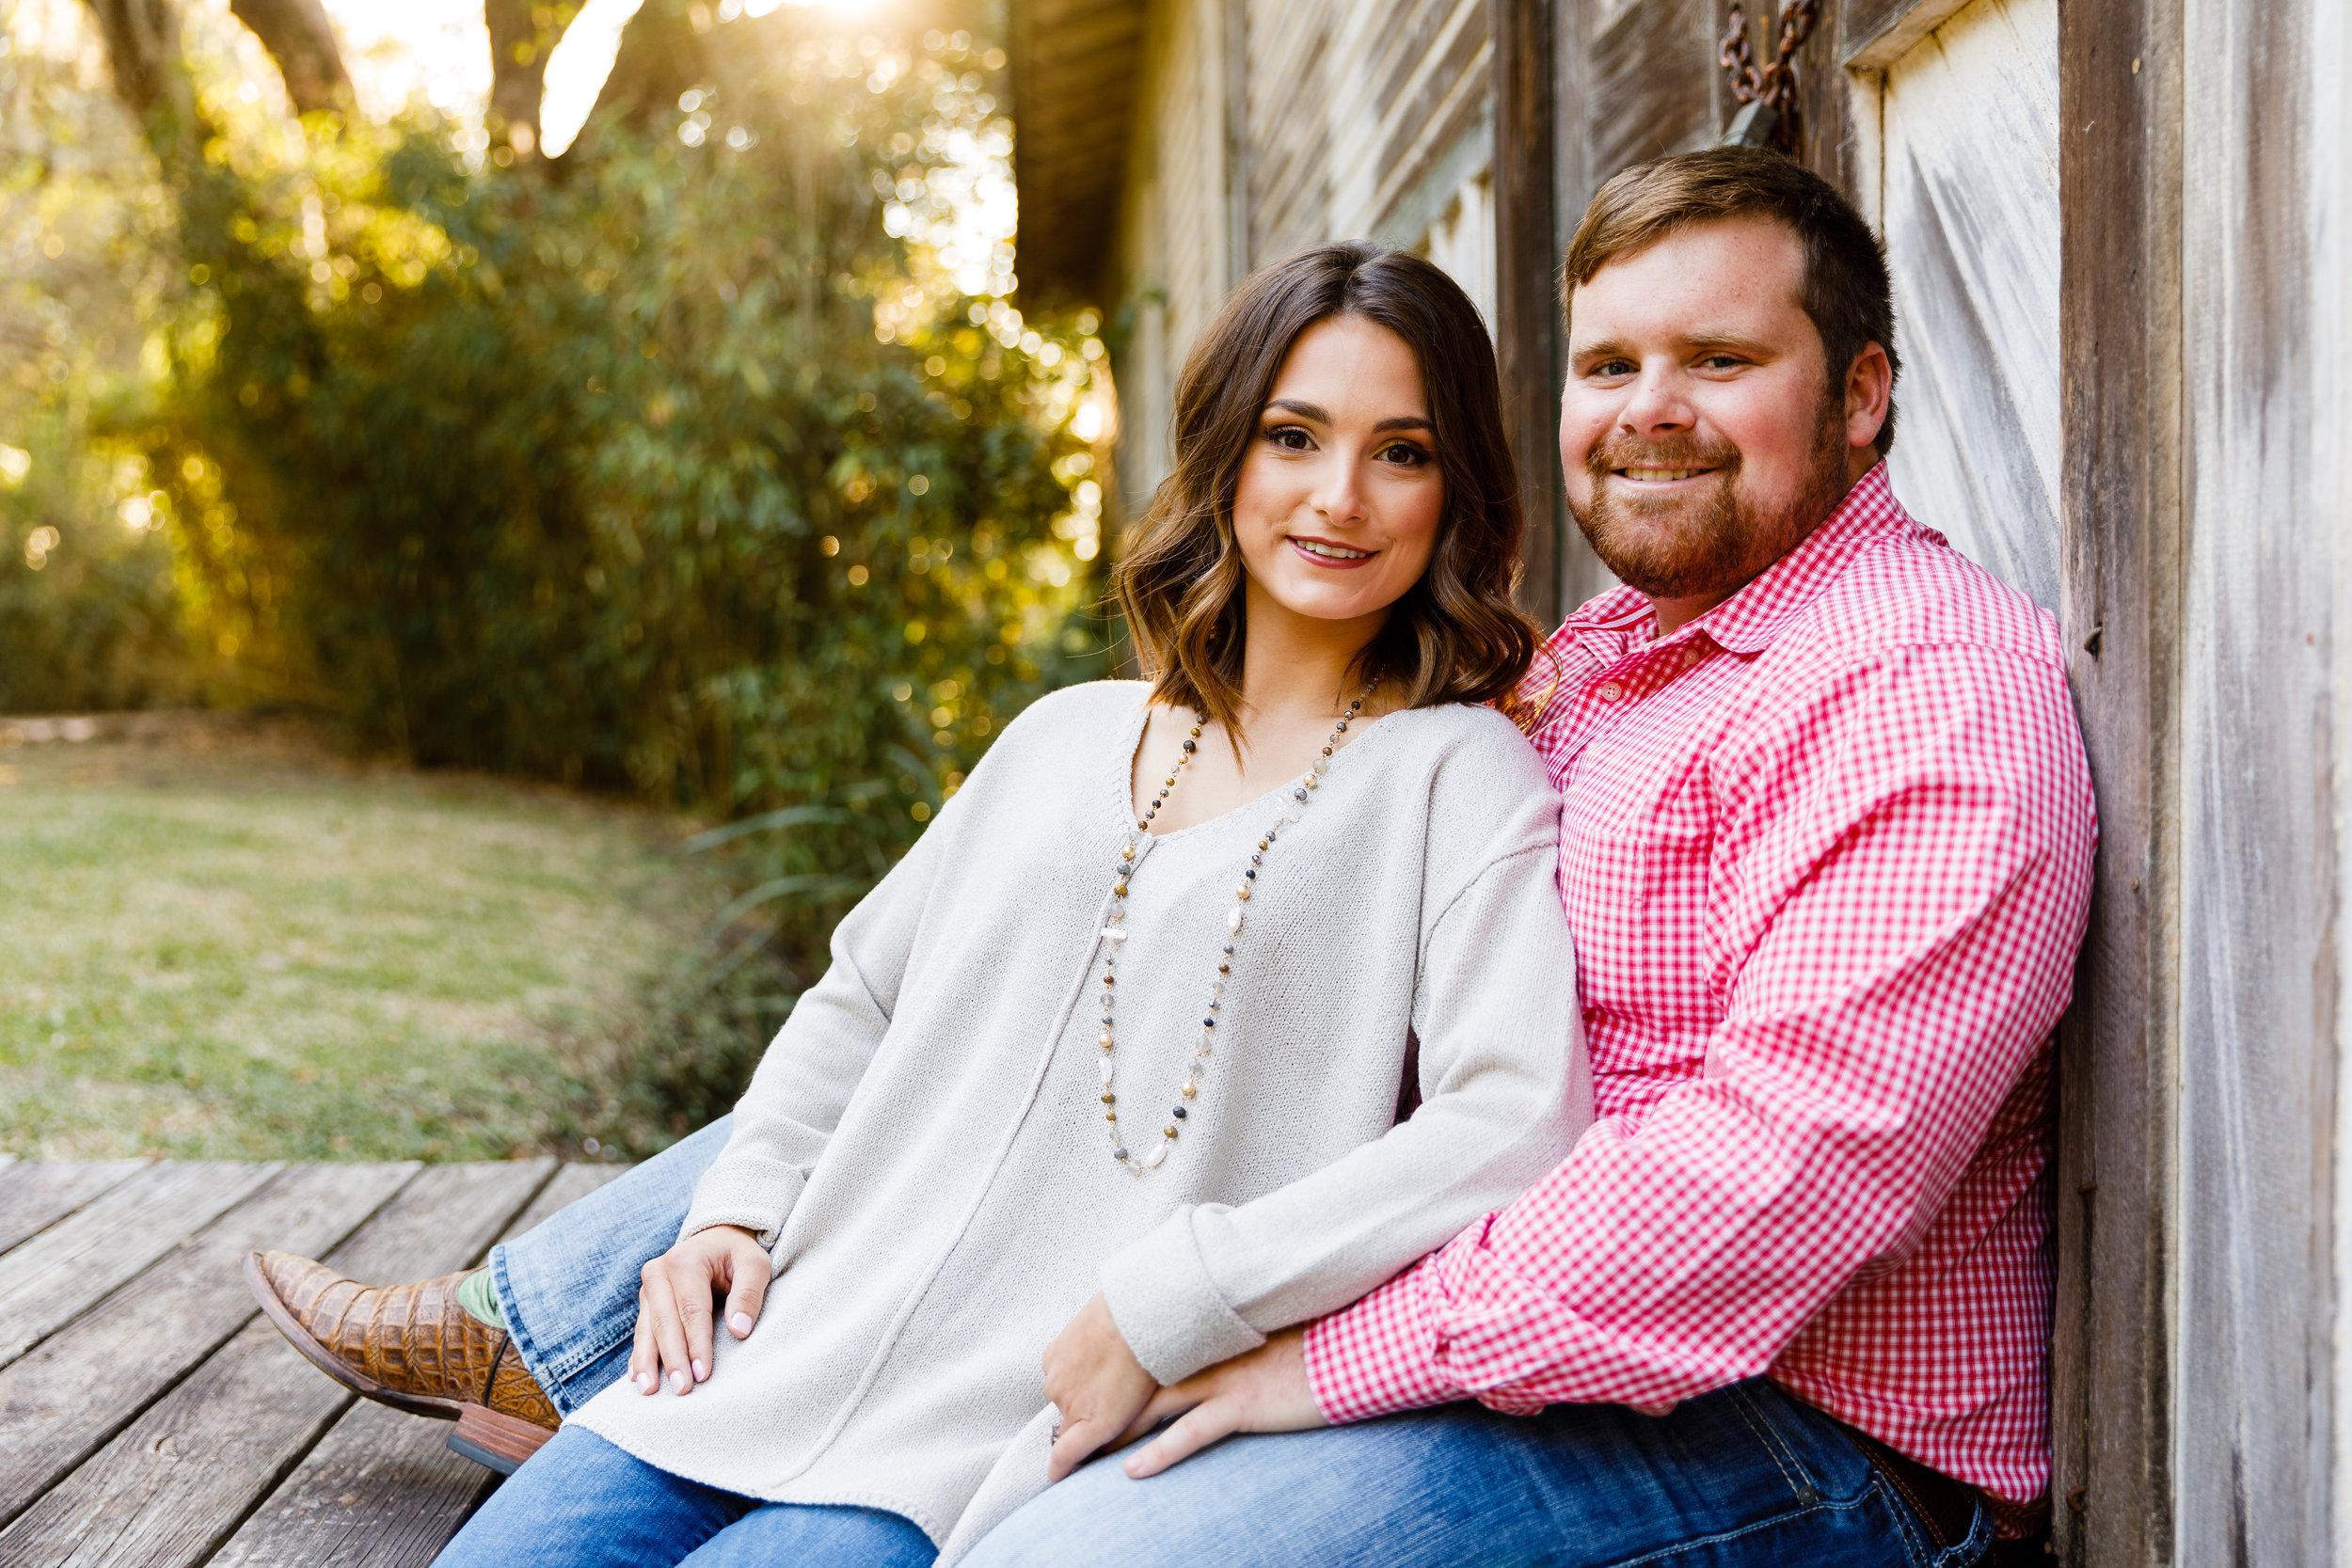 Youngsville-lafayette-portrait-family-wedding-photographer-0493.jpg